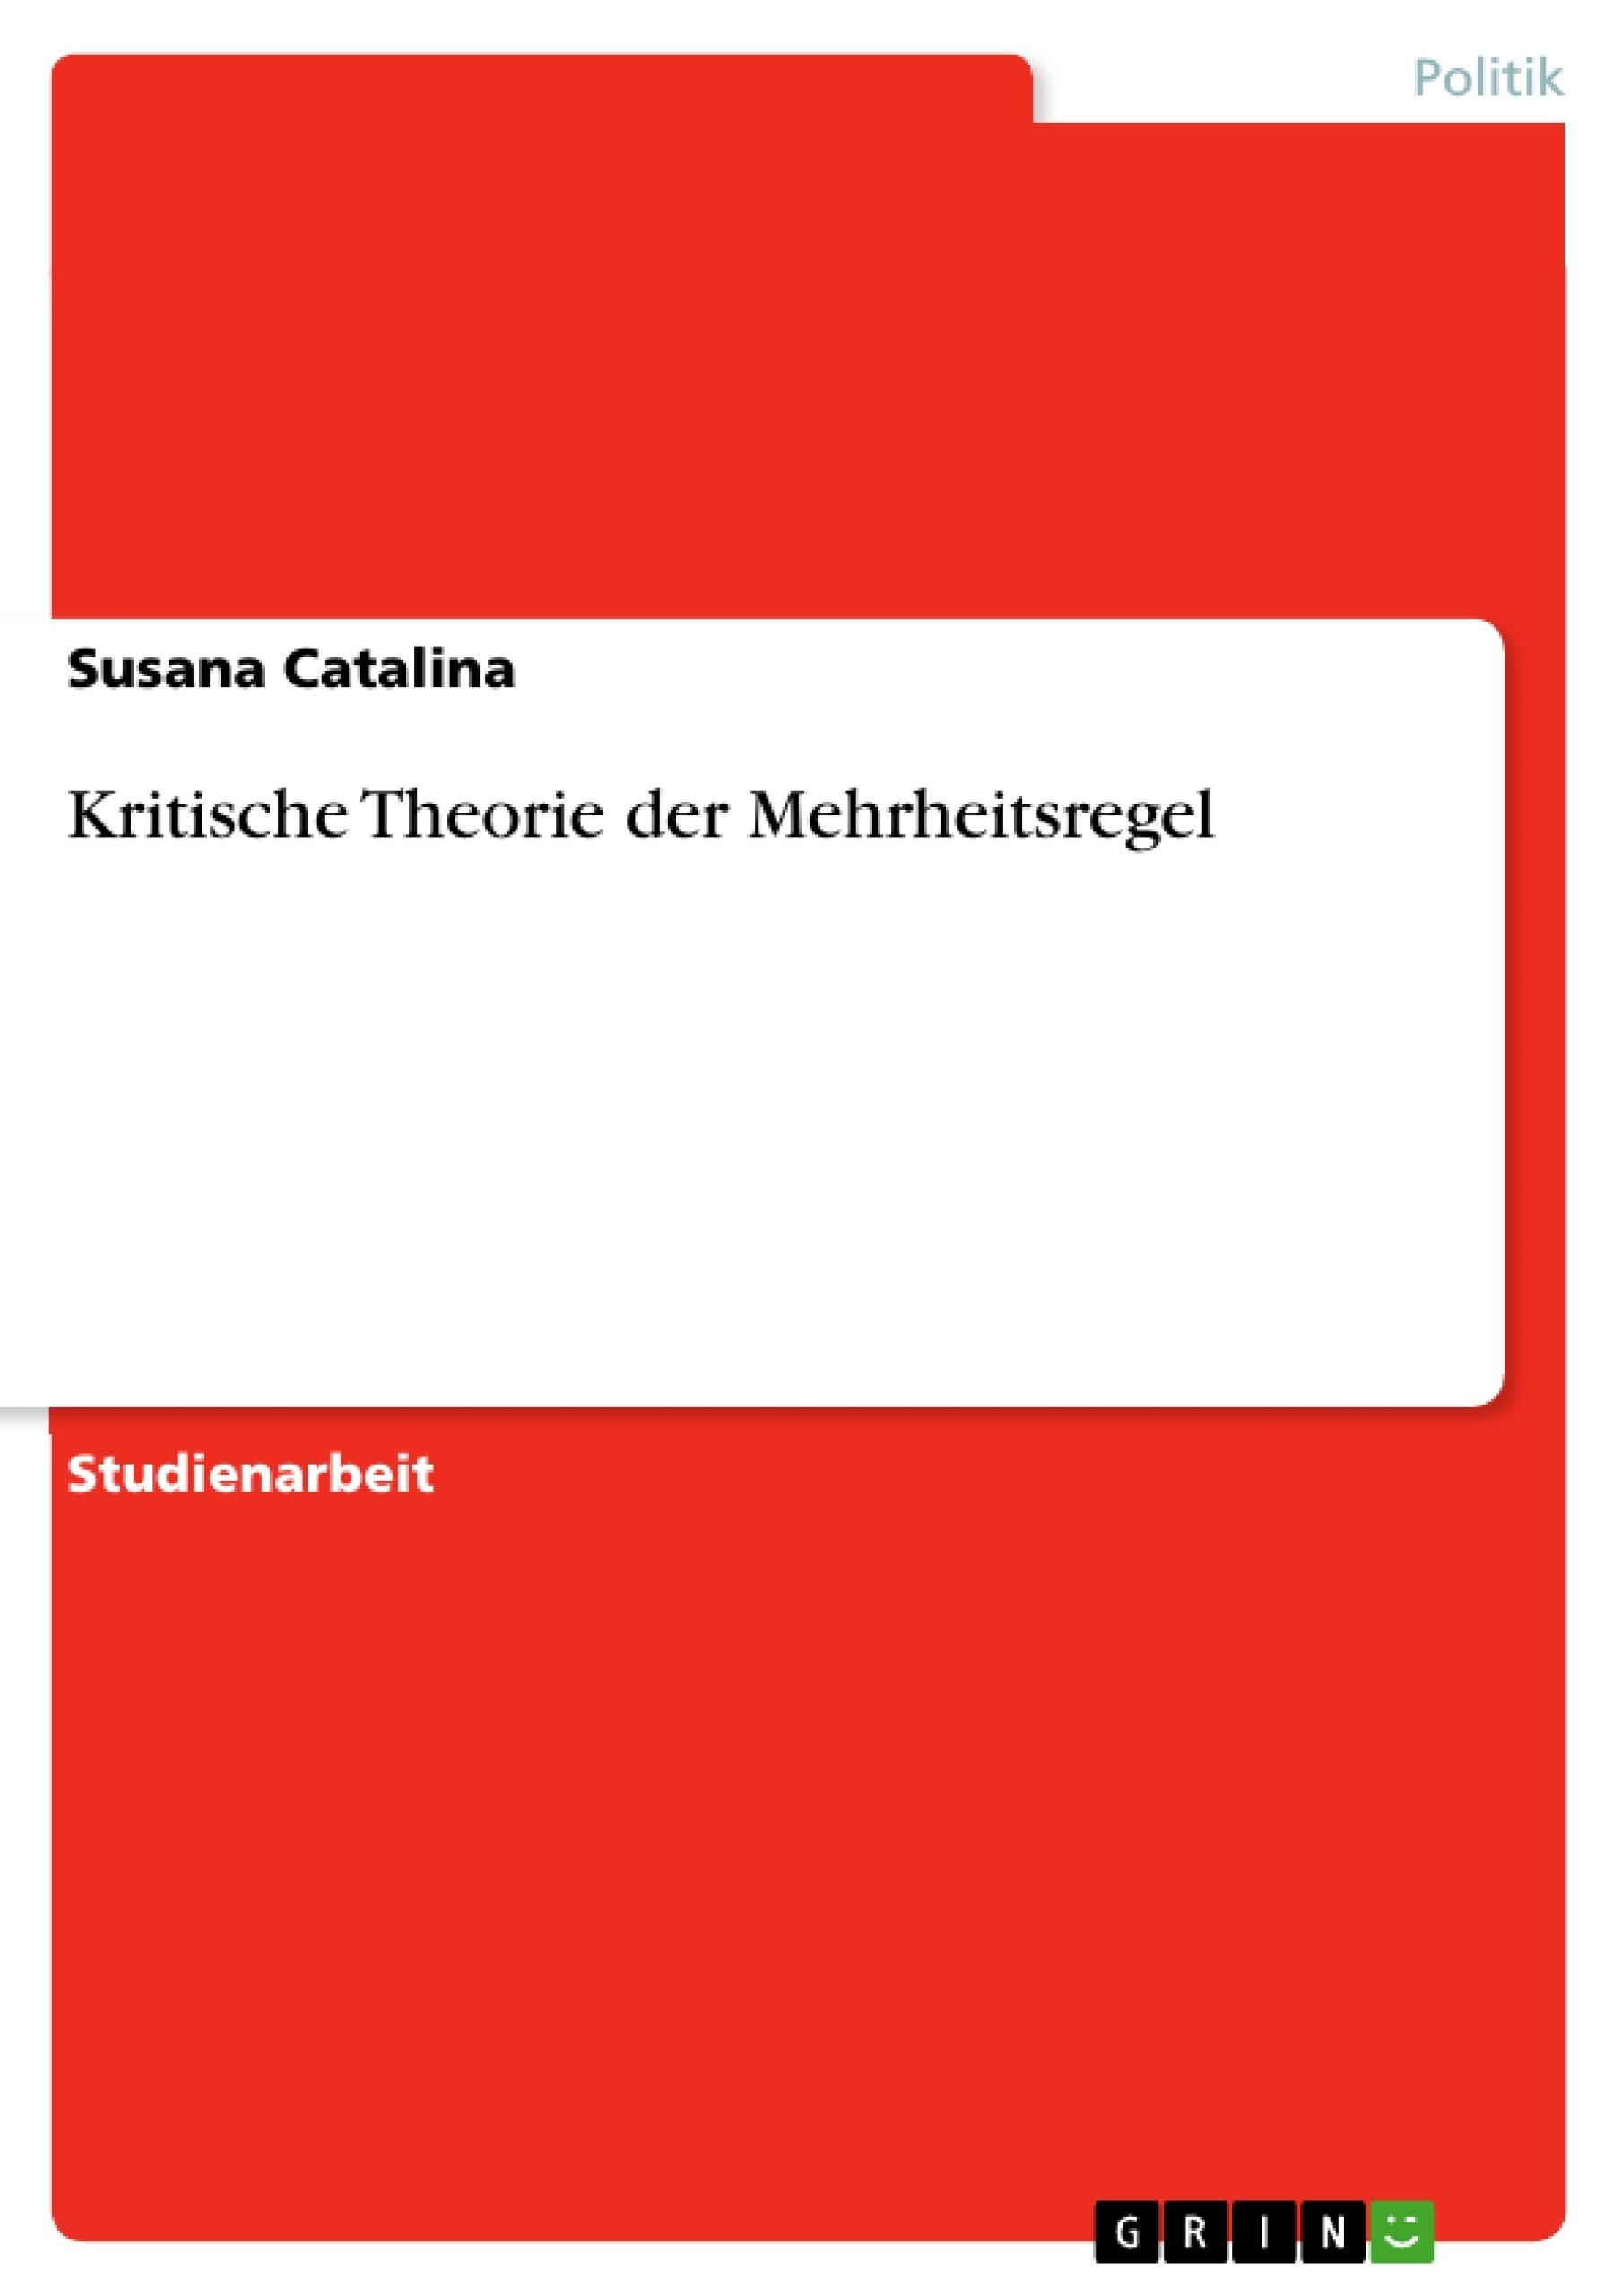 Titel: Kritische Theorie der Mehrheitsregel